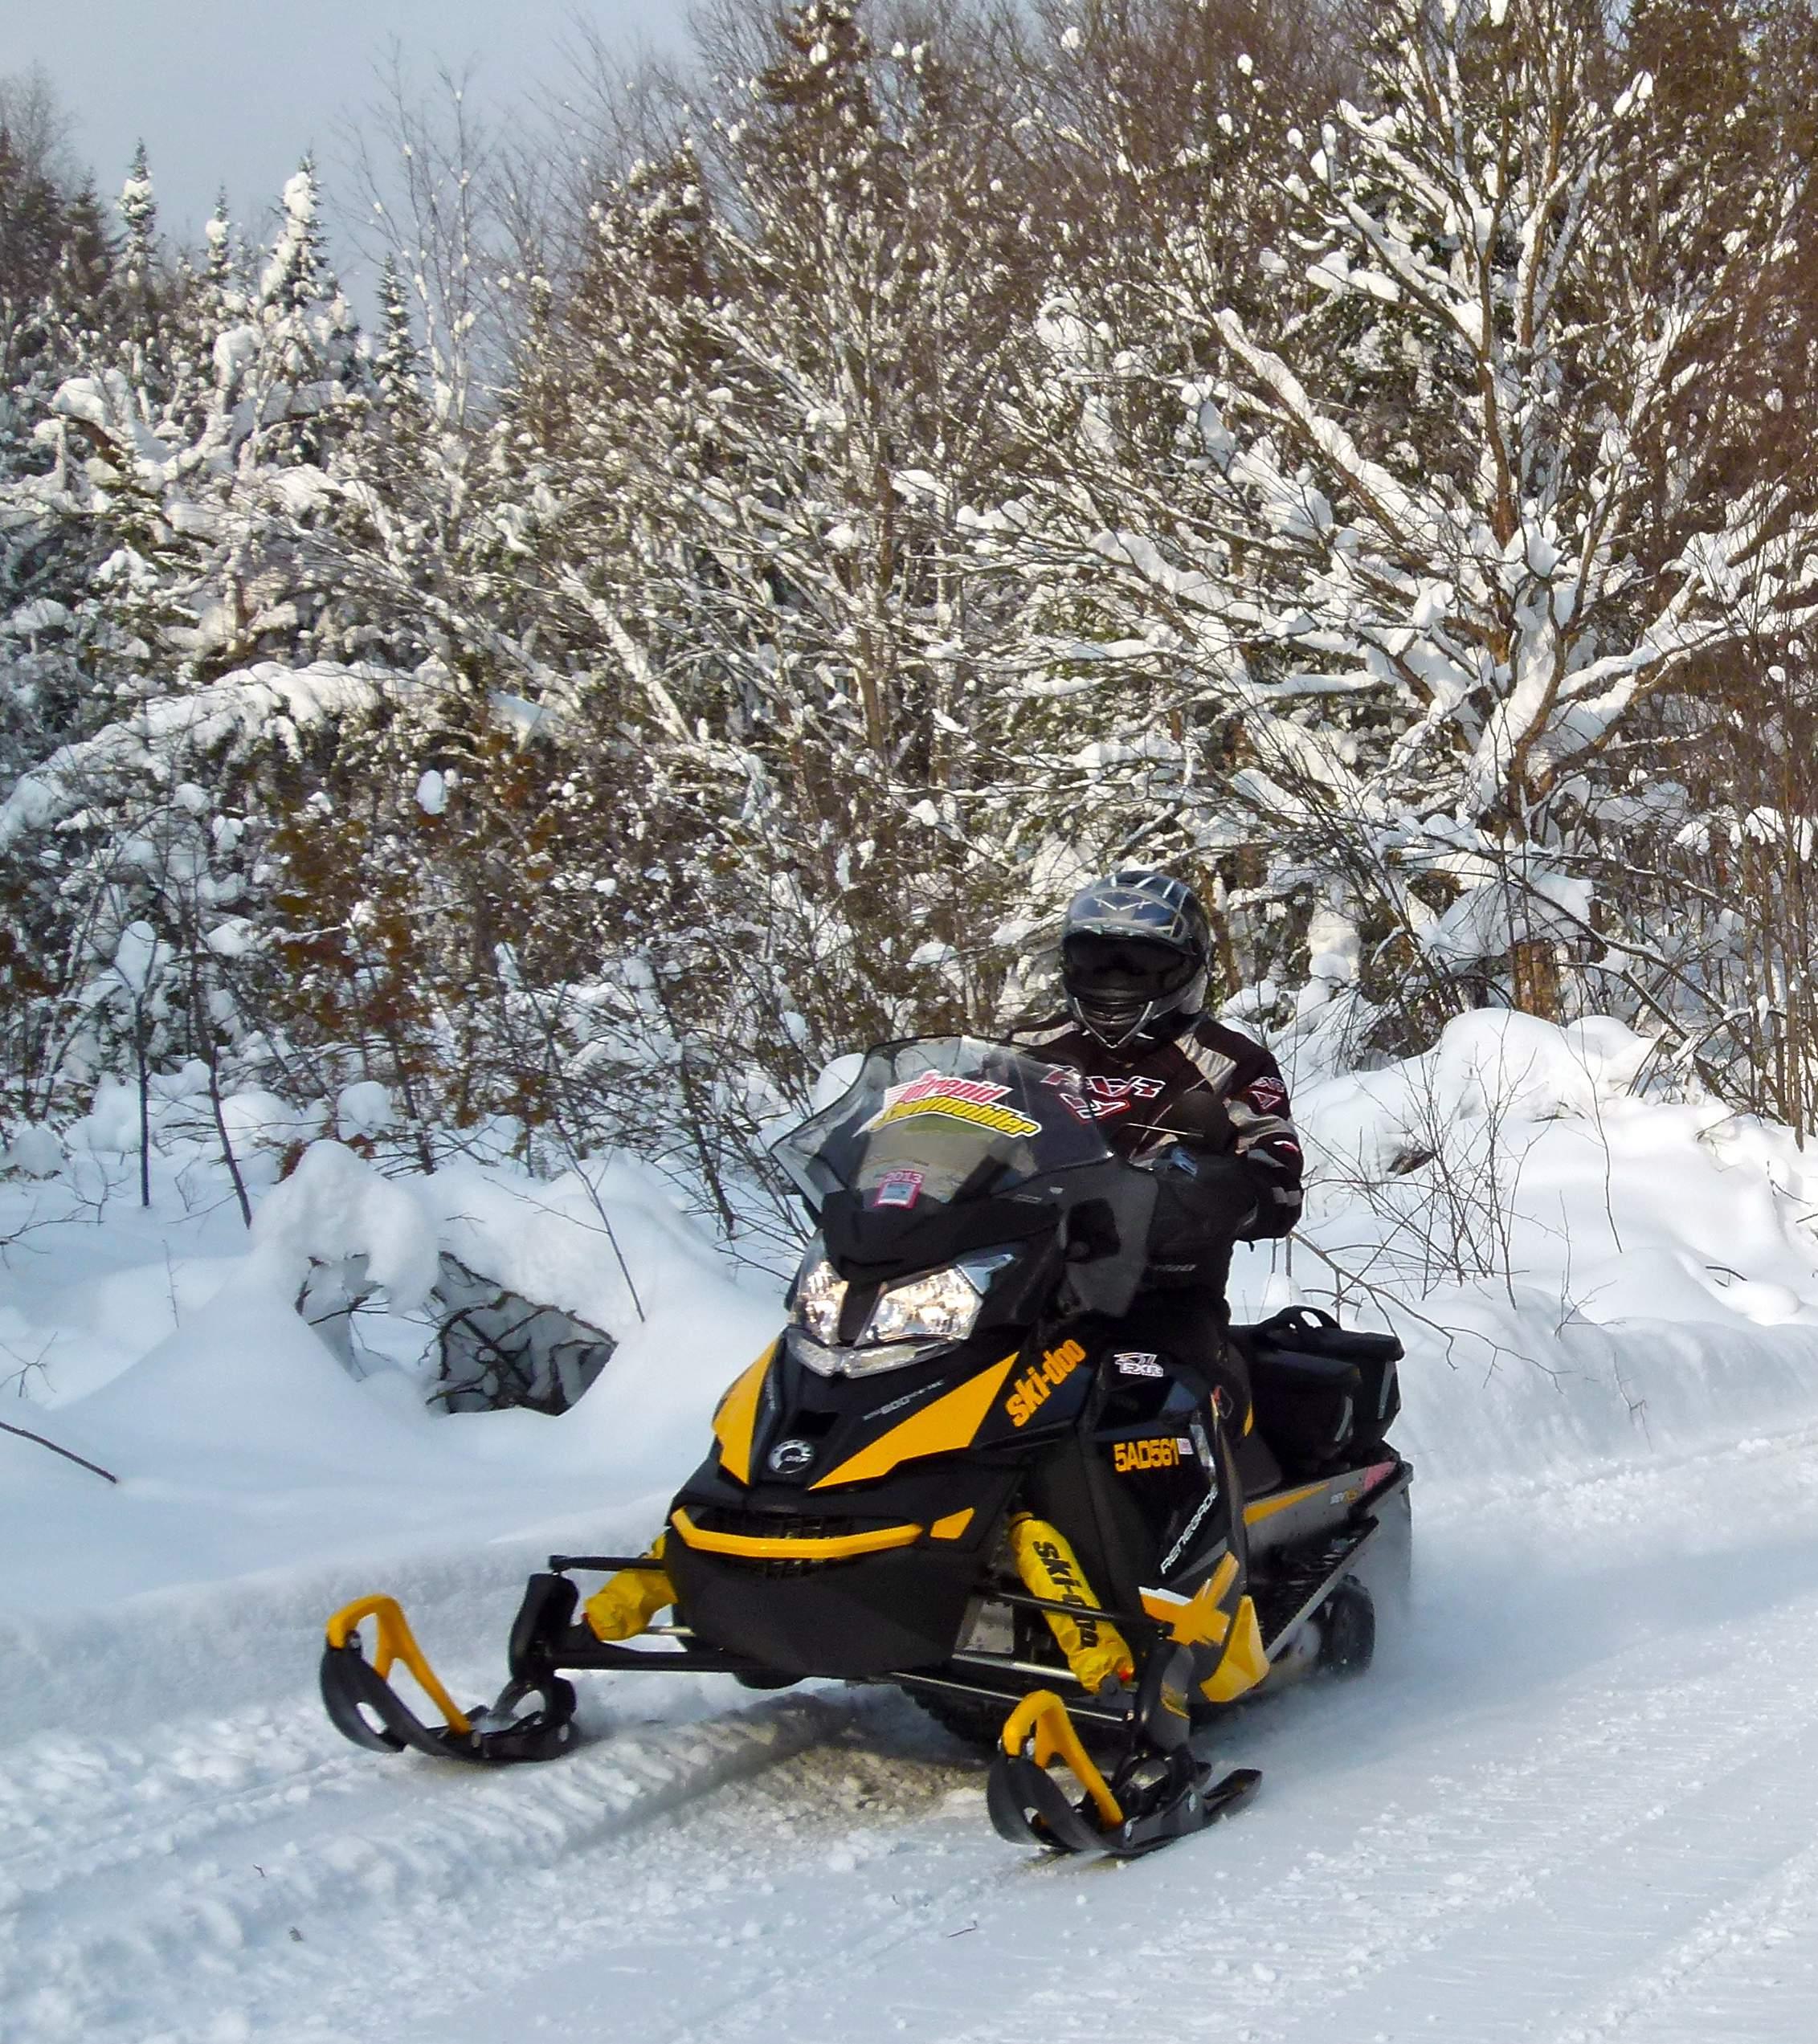 2013 Ski Doo Renegade X & Accessories